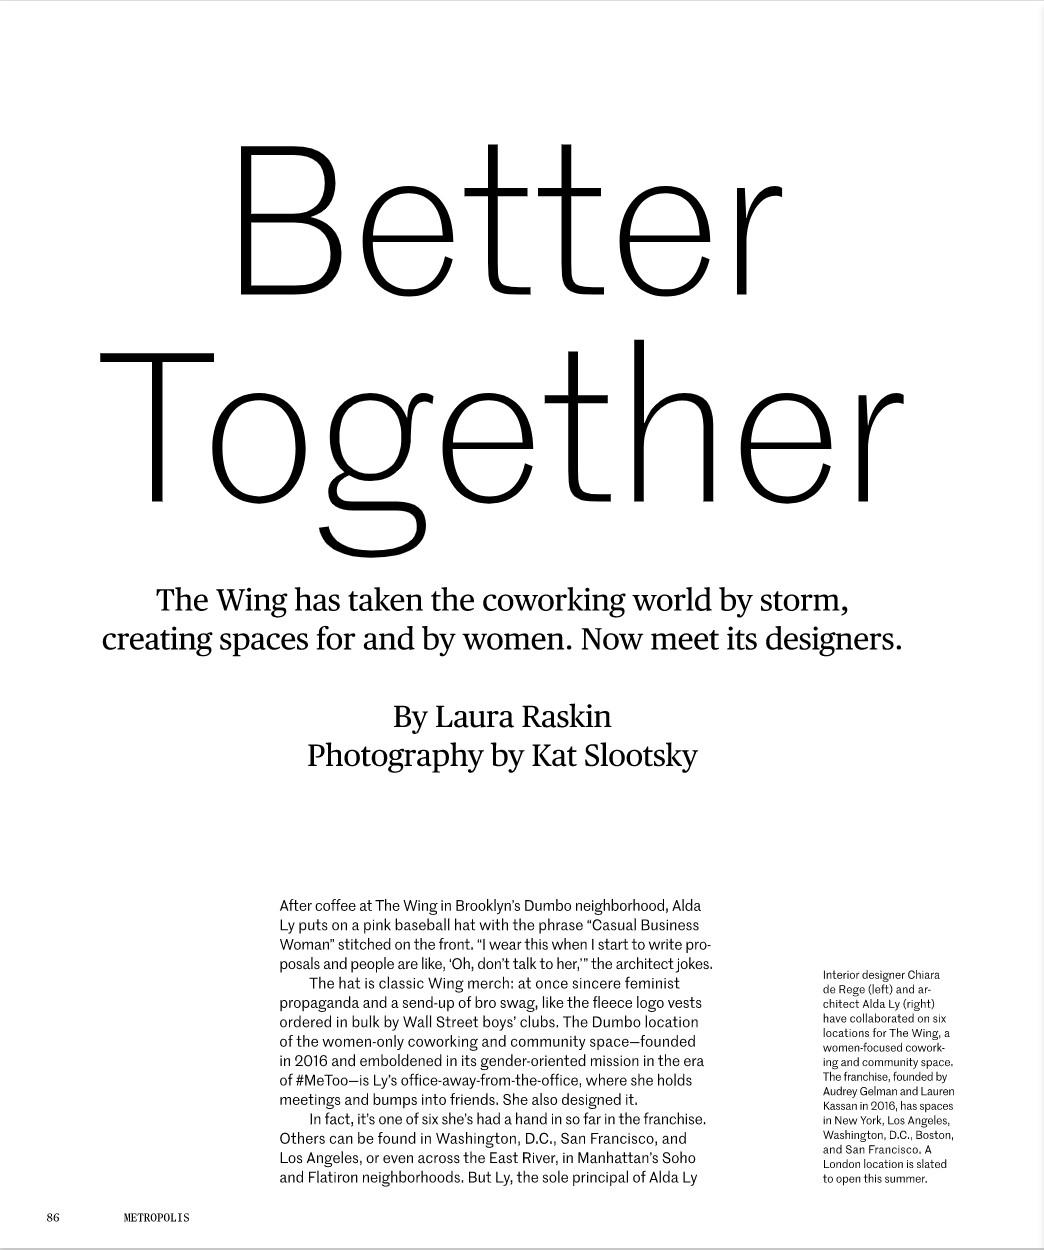 pg.86